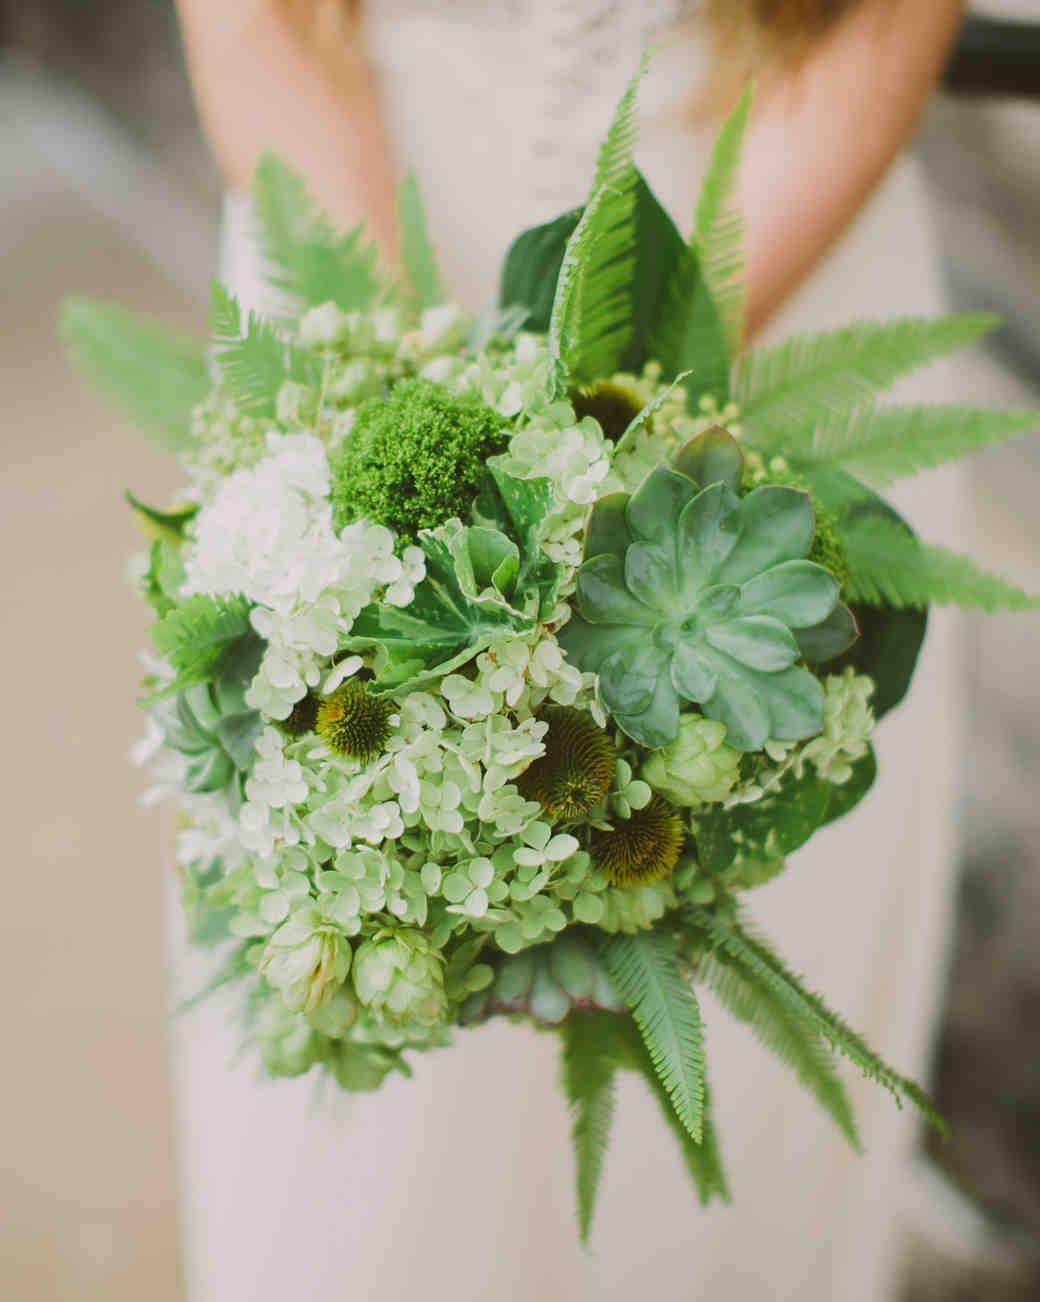 Fern Wedding Bouquet with Succulents and Hydrangeas